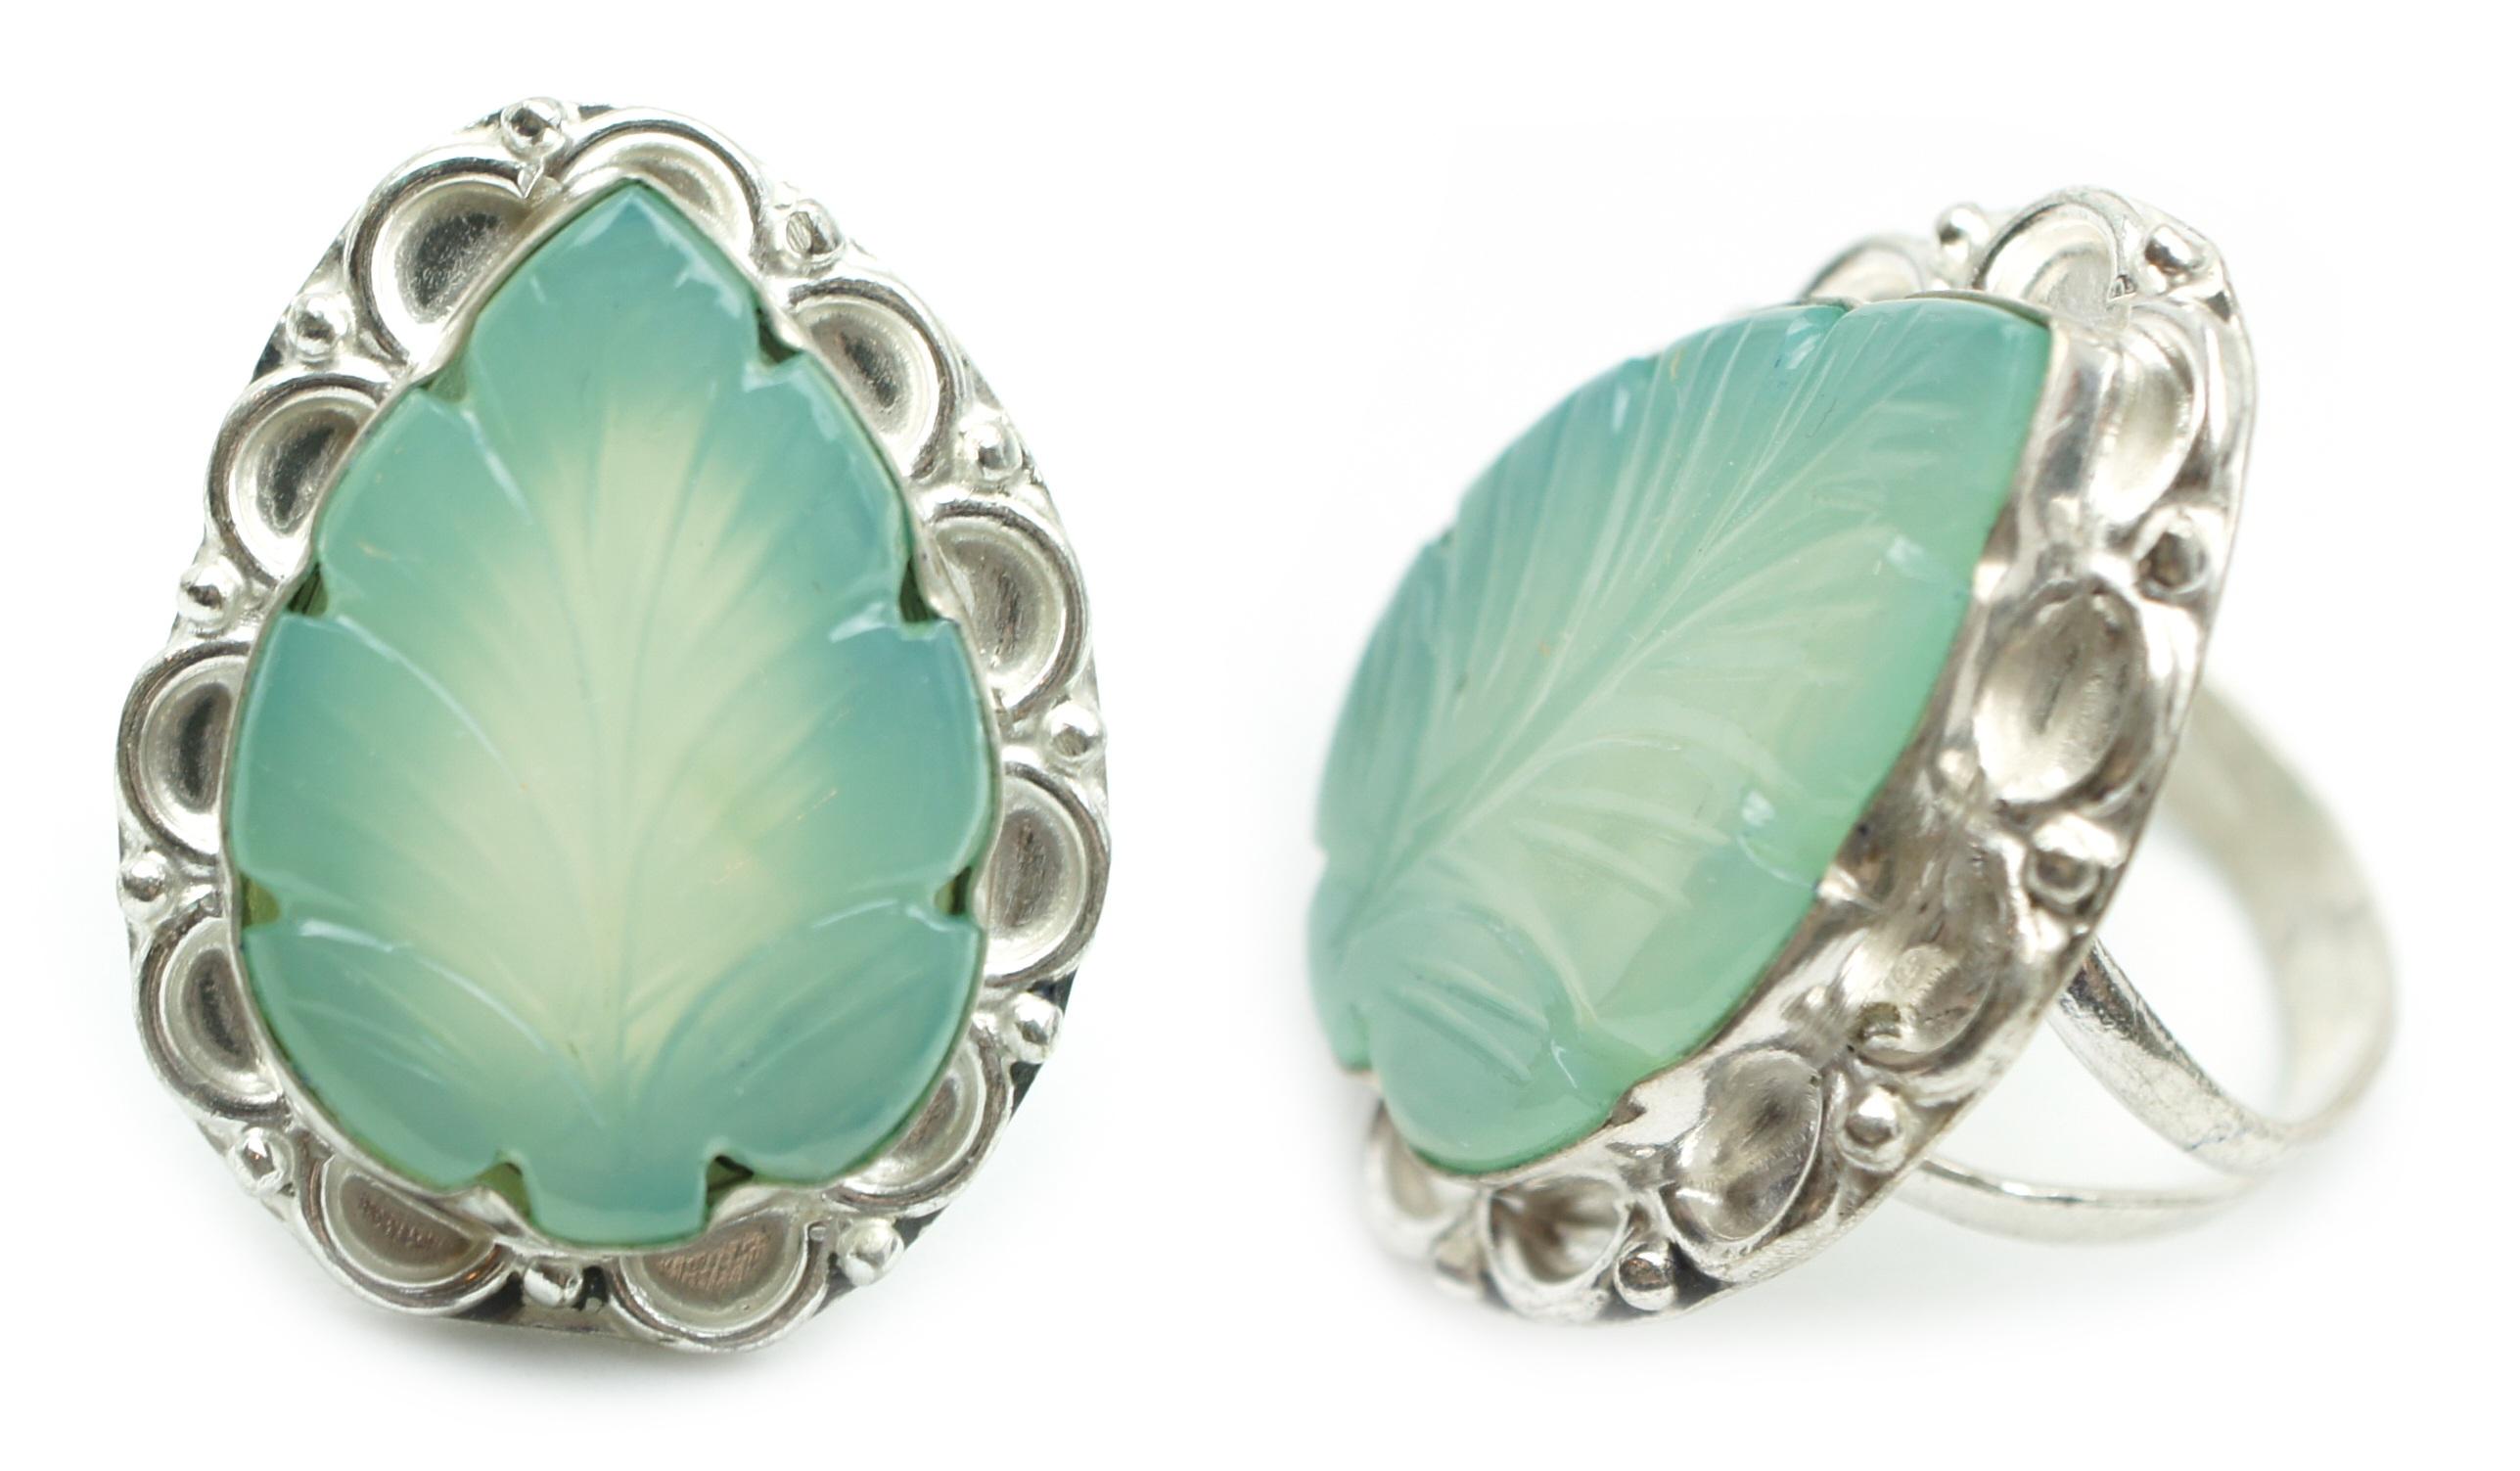 Gambar Putih Daun Cincin Terpencil Hijau Set Perhiasan 1 Perak Batu Pirus Pameran Anting